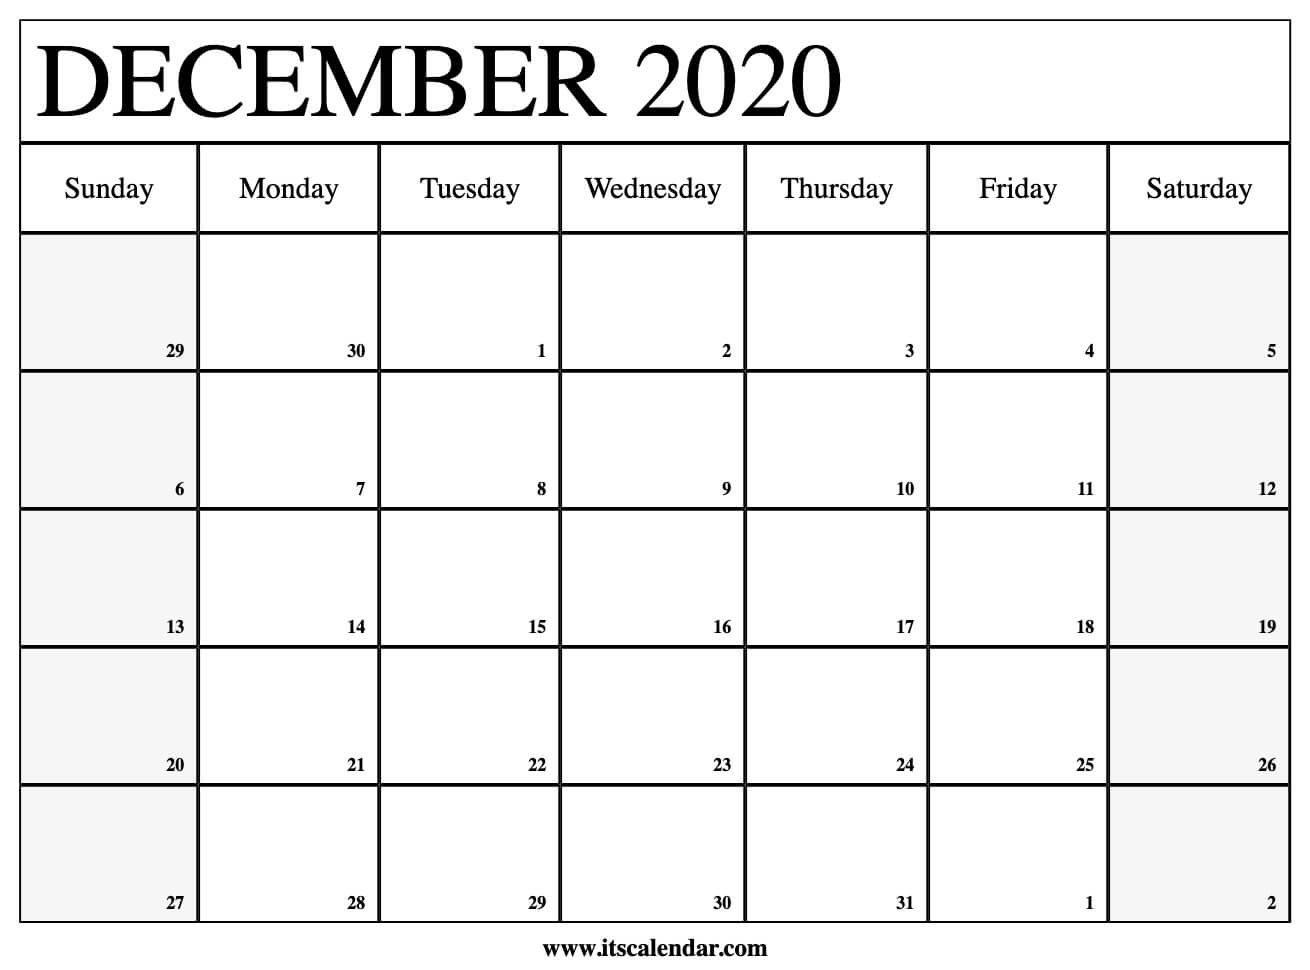 Take October To December 2020 Calendar | Calendar Depo Provera Calendar Printable Pdf Based On 3 Months